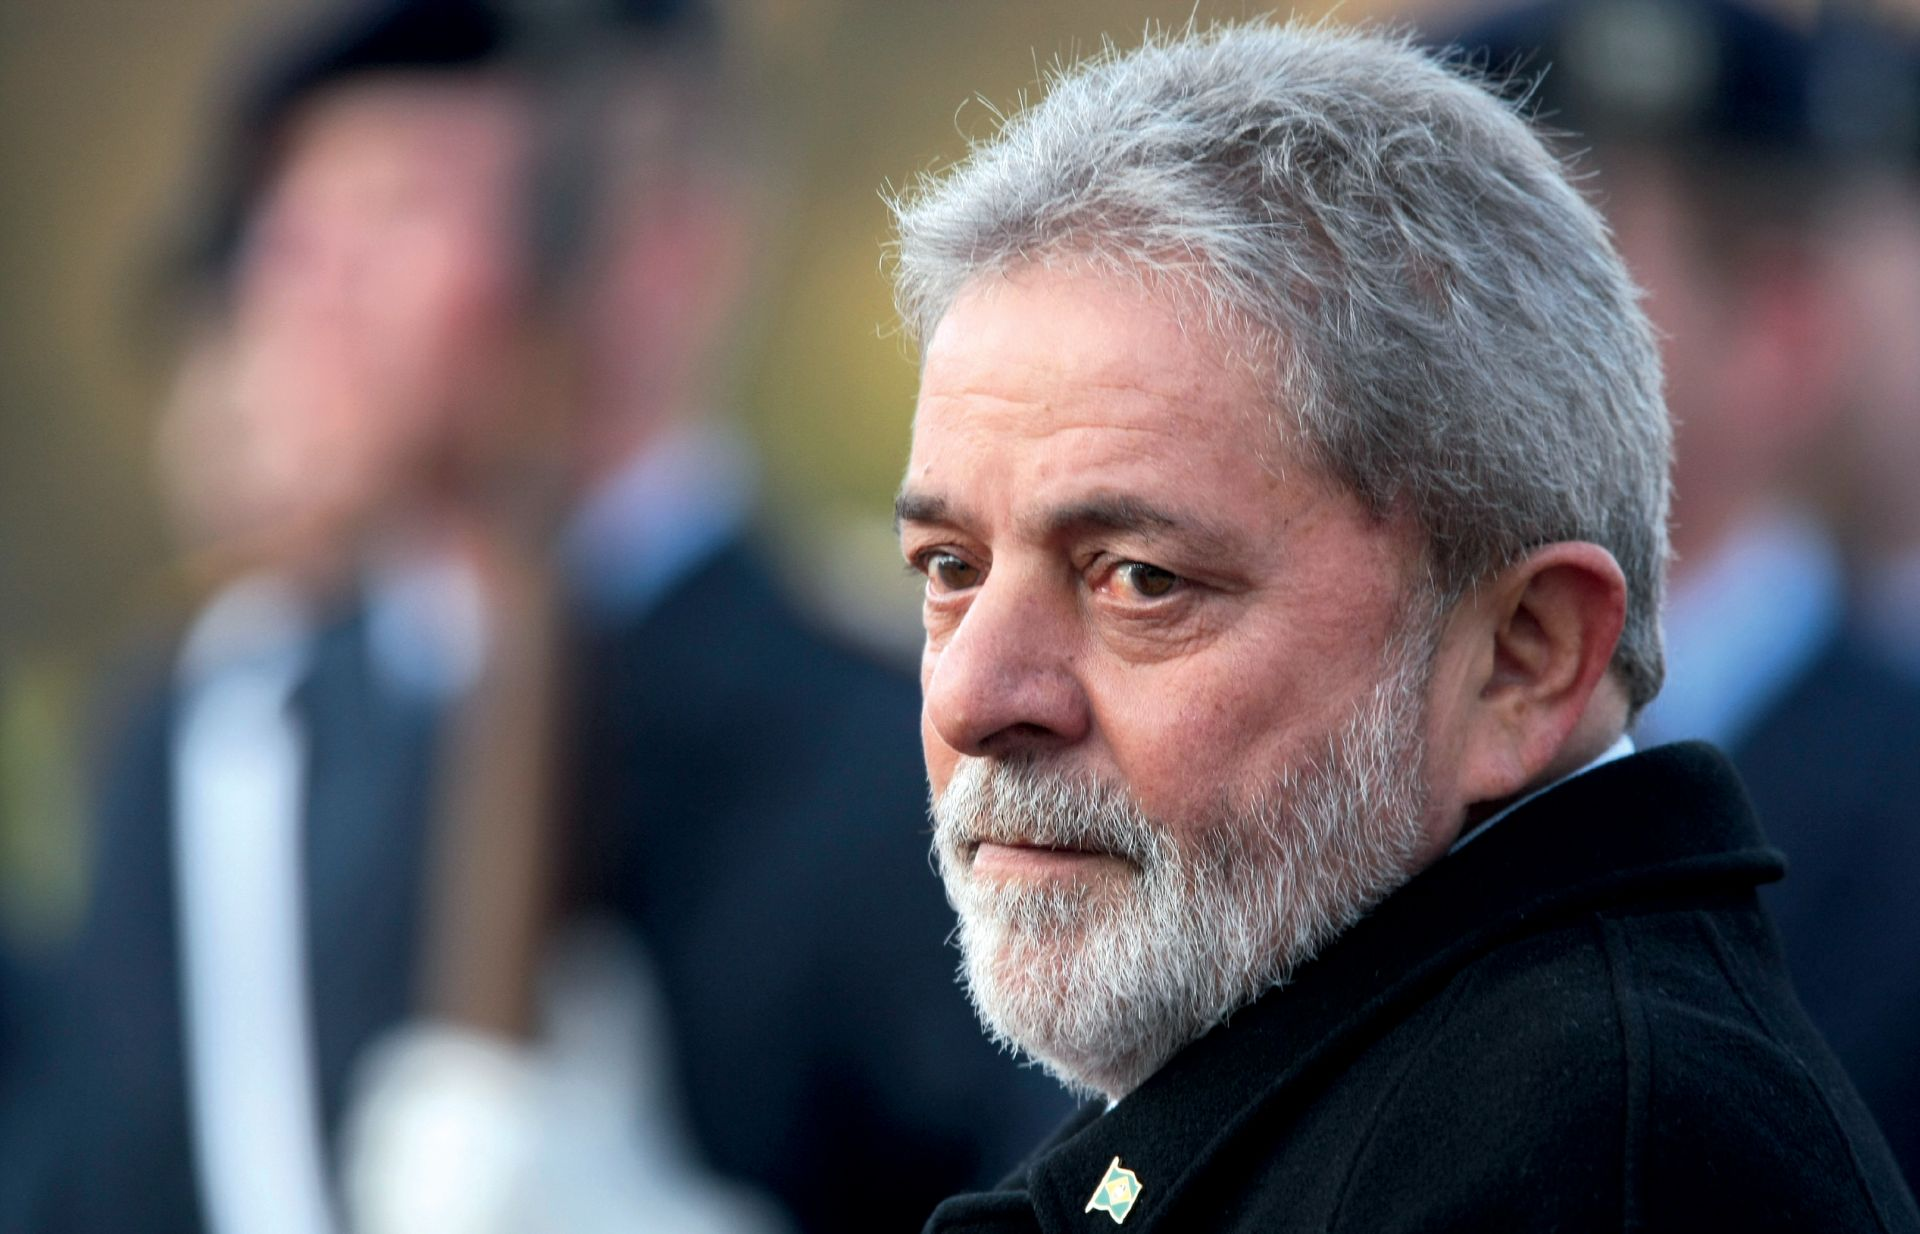 Korupcijski skandal heroja brazilske radničke klase